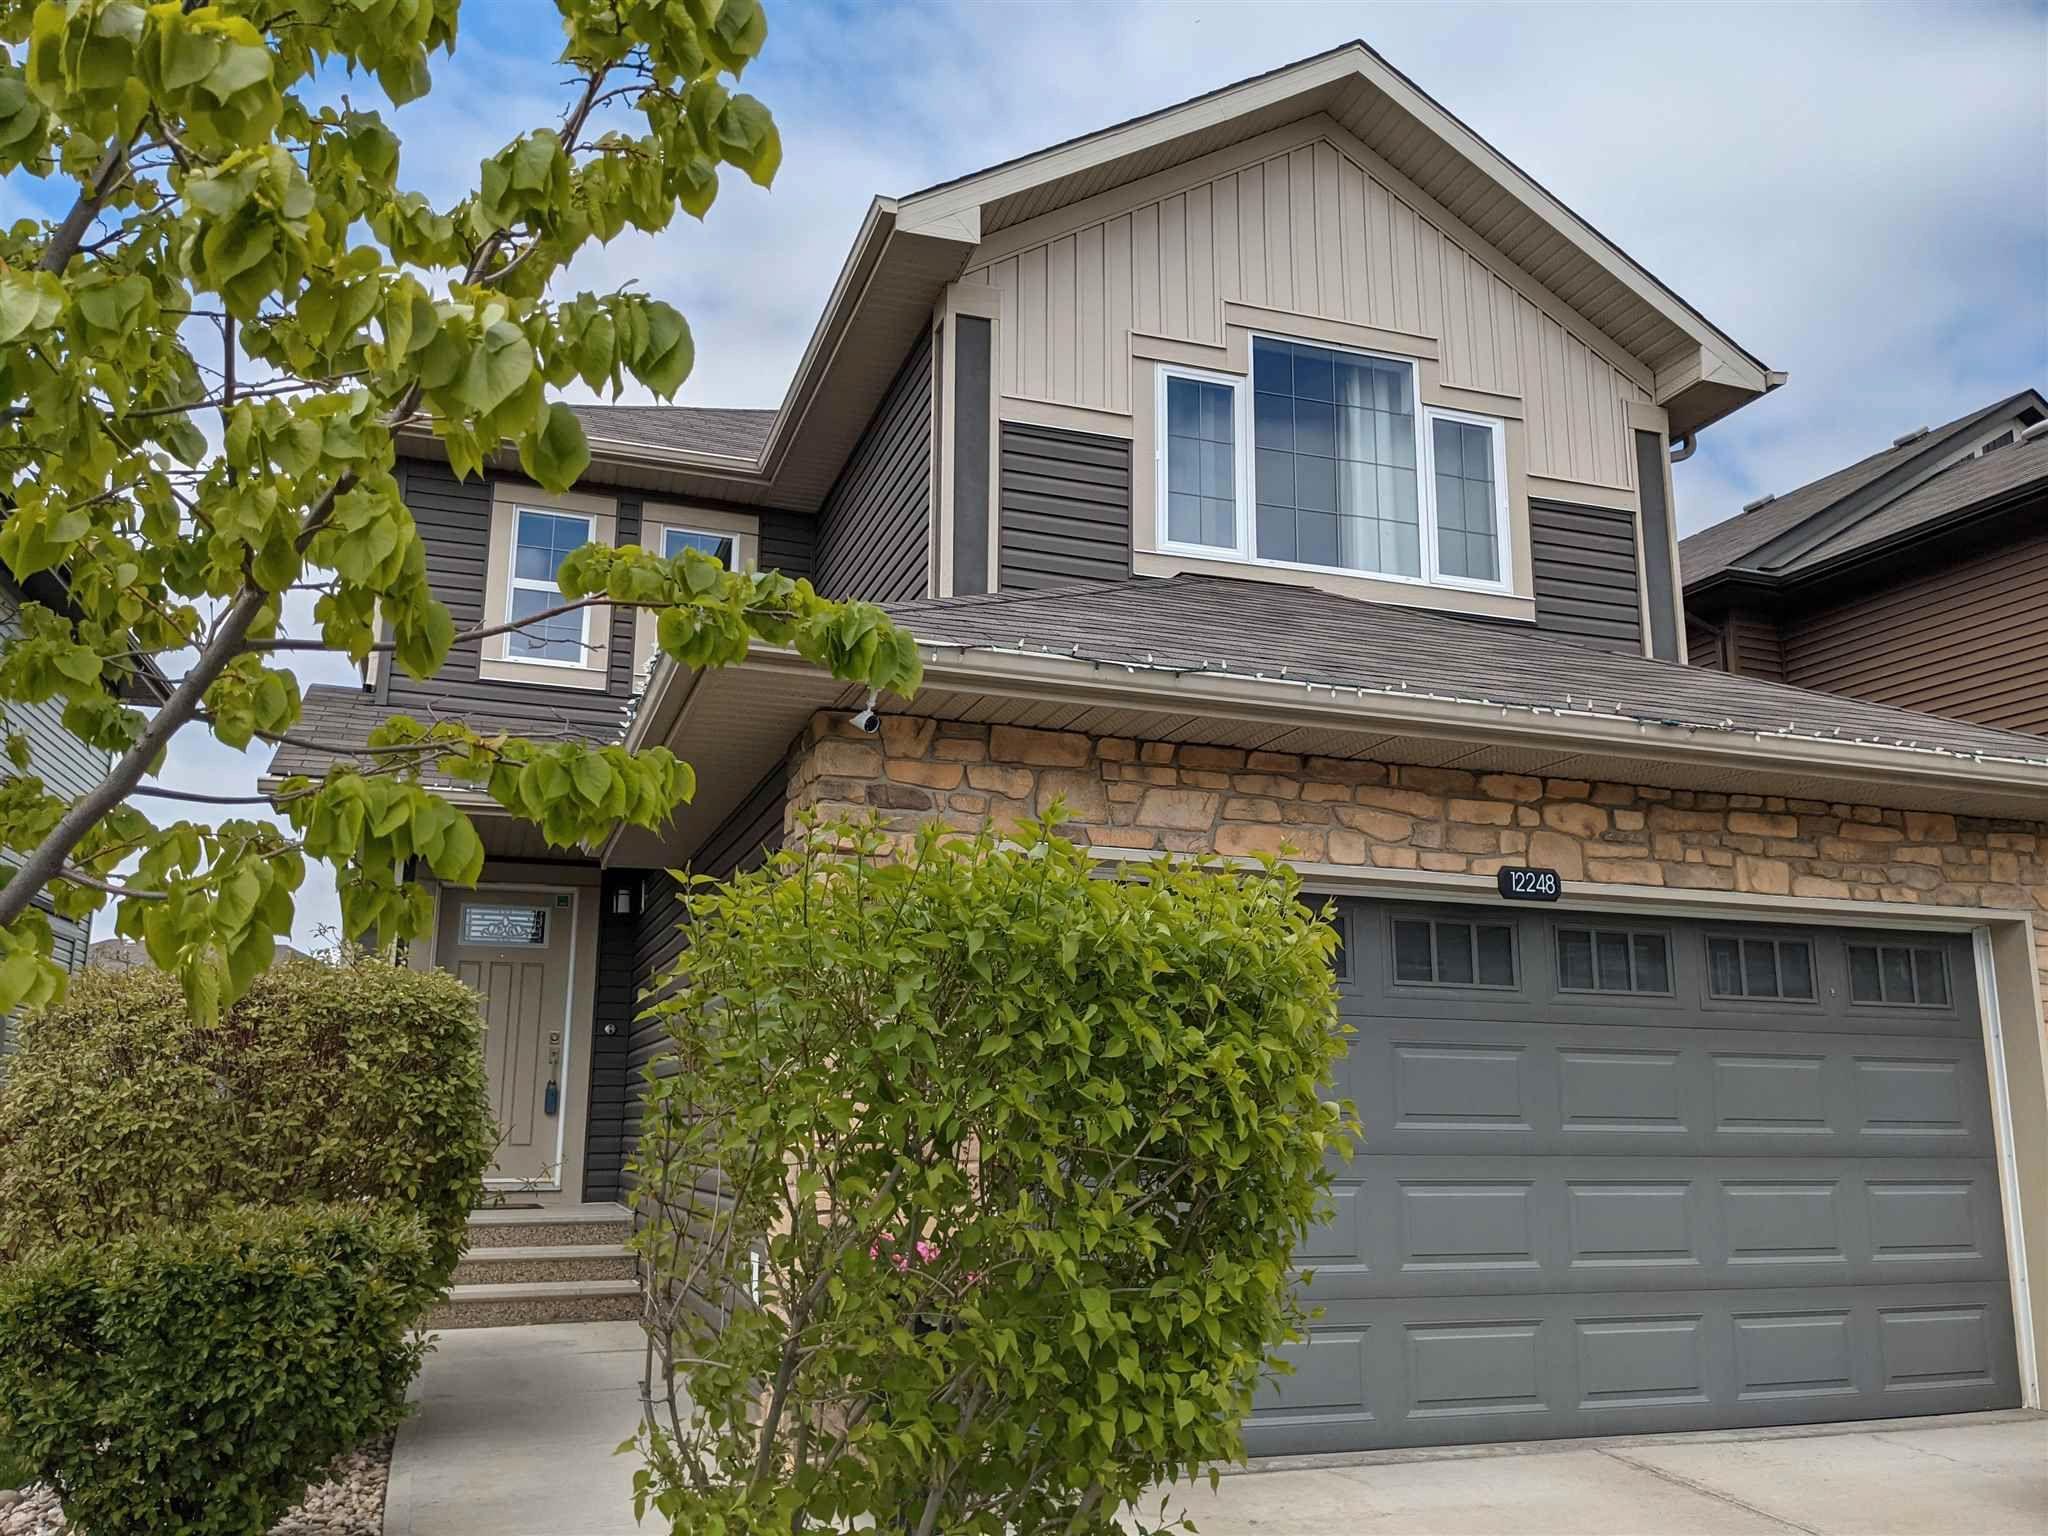 Main Photo: 12248 170 Avenue in Edmonton: Zone 27 House for sale : MLS®# E4246054